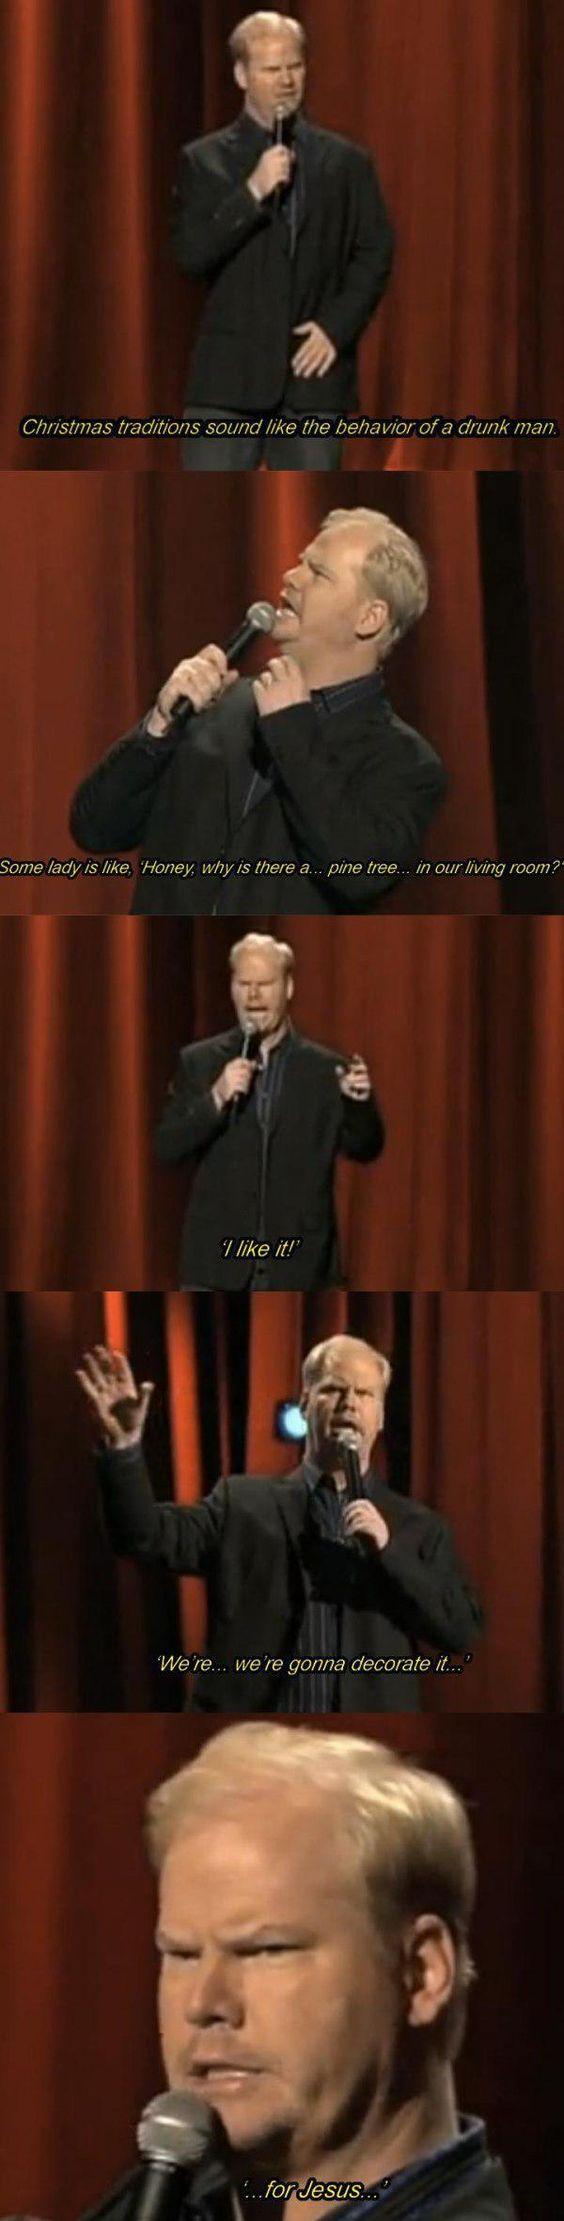 Jim-Gaffigan-quotes-funny-3